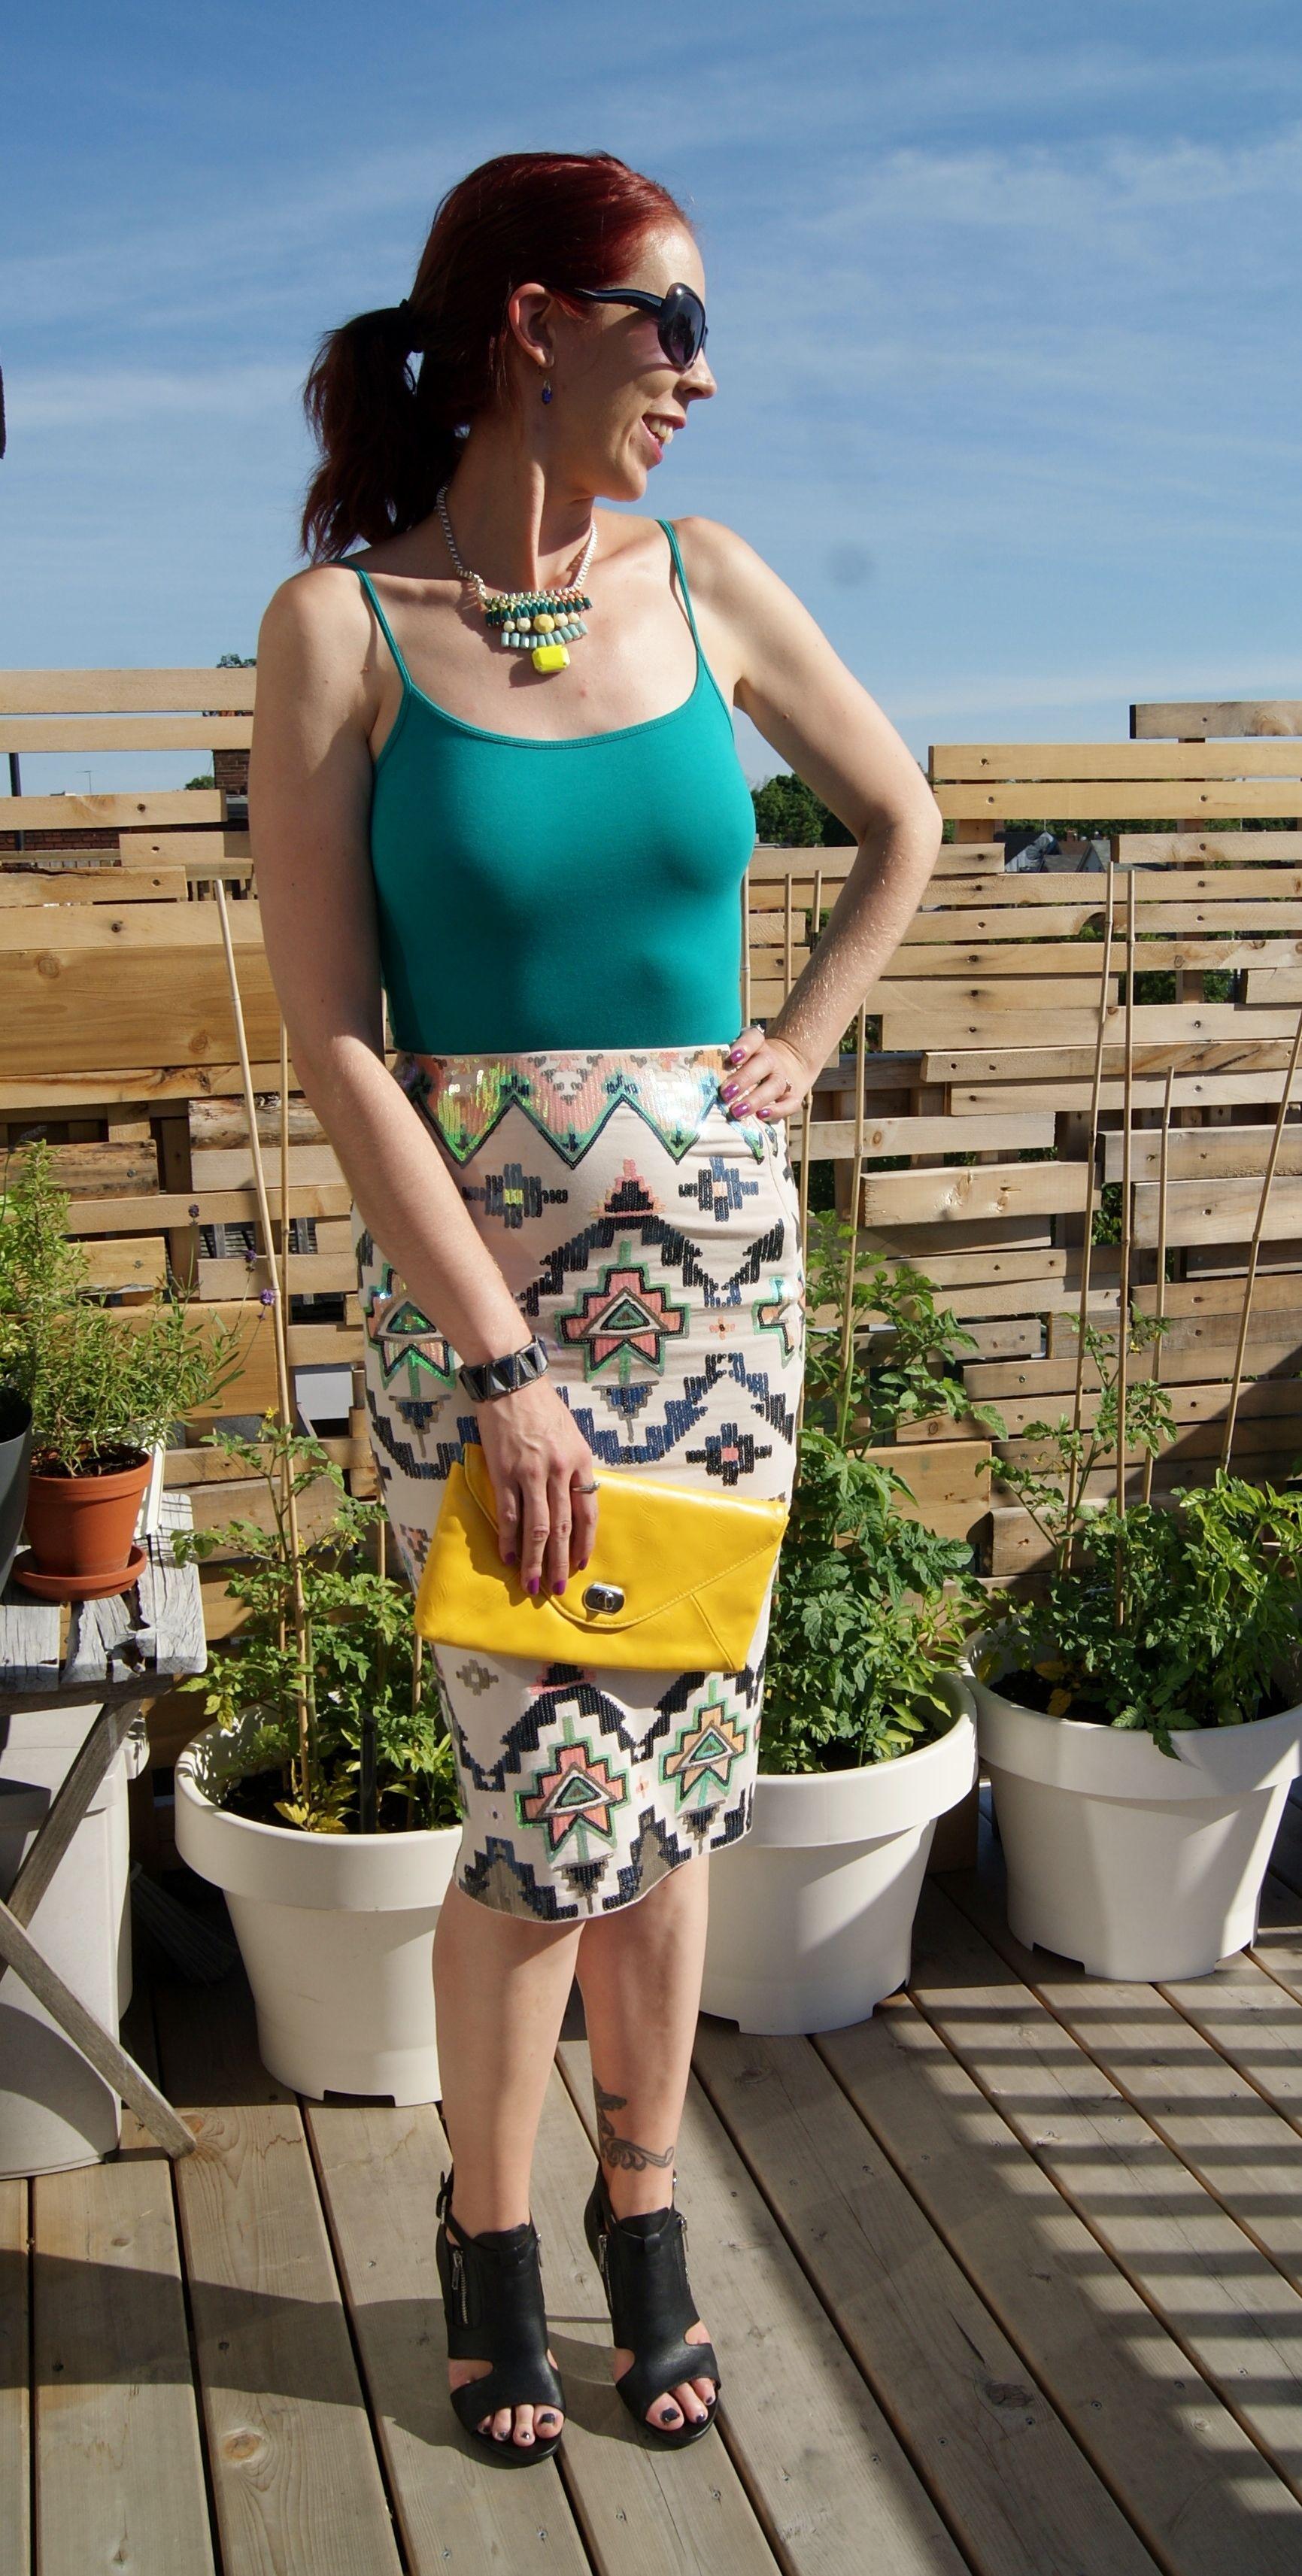 My Style!: Aztec Embellishment! @expresslife midi skirt, @shopforjayu necklace, @forever21 booties!: http://www.thepurplescarf.ca/2014/07/fashion-style-aztec-embellishment-from-express.html #fashion #style #styletips #aztec #midiskirt #mystyle #thepurplescarf #melanieps